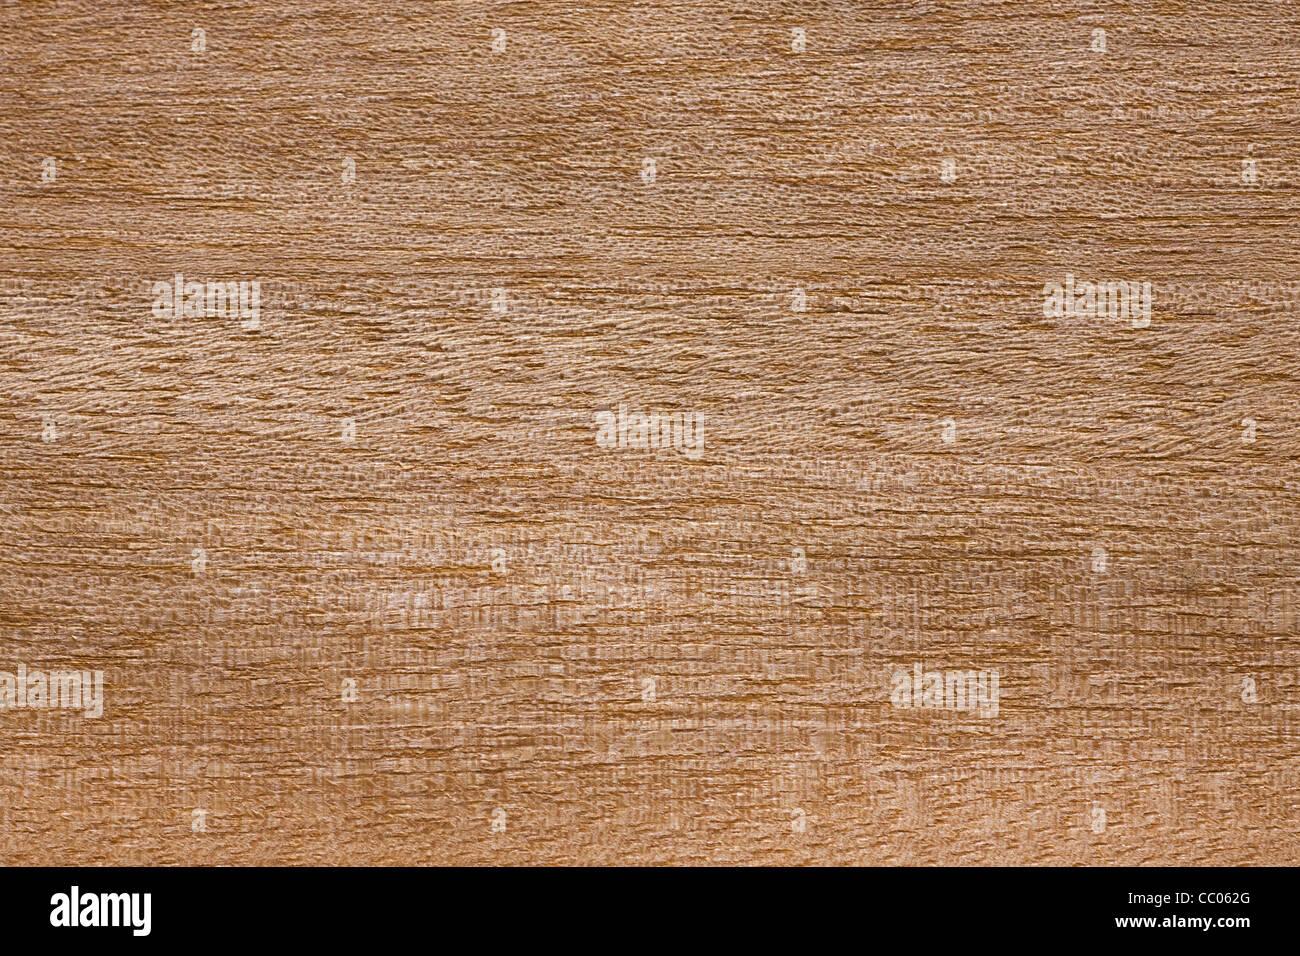 Grain du bois d'Anegre / Asamfona Aningre / / Kali / tonewood (Aningeria altissima), l'Afrique Photo Stock